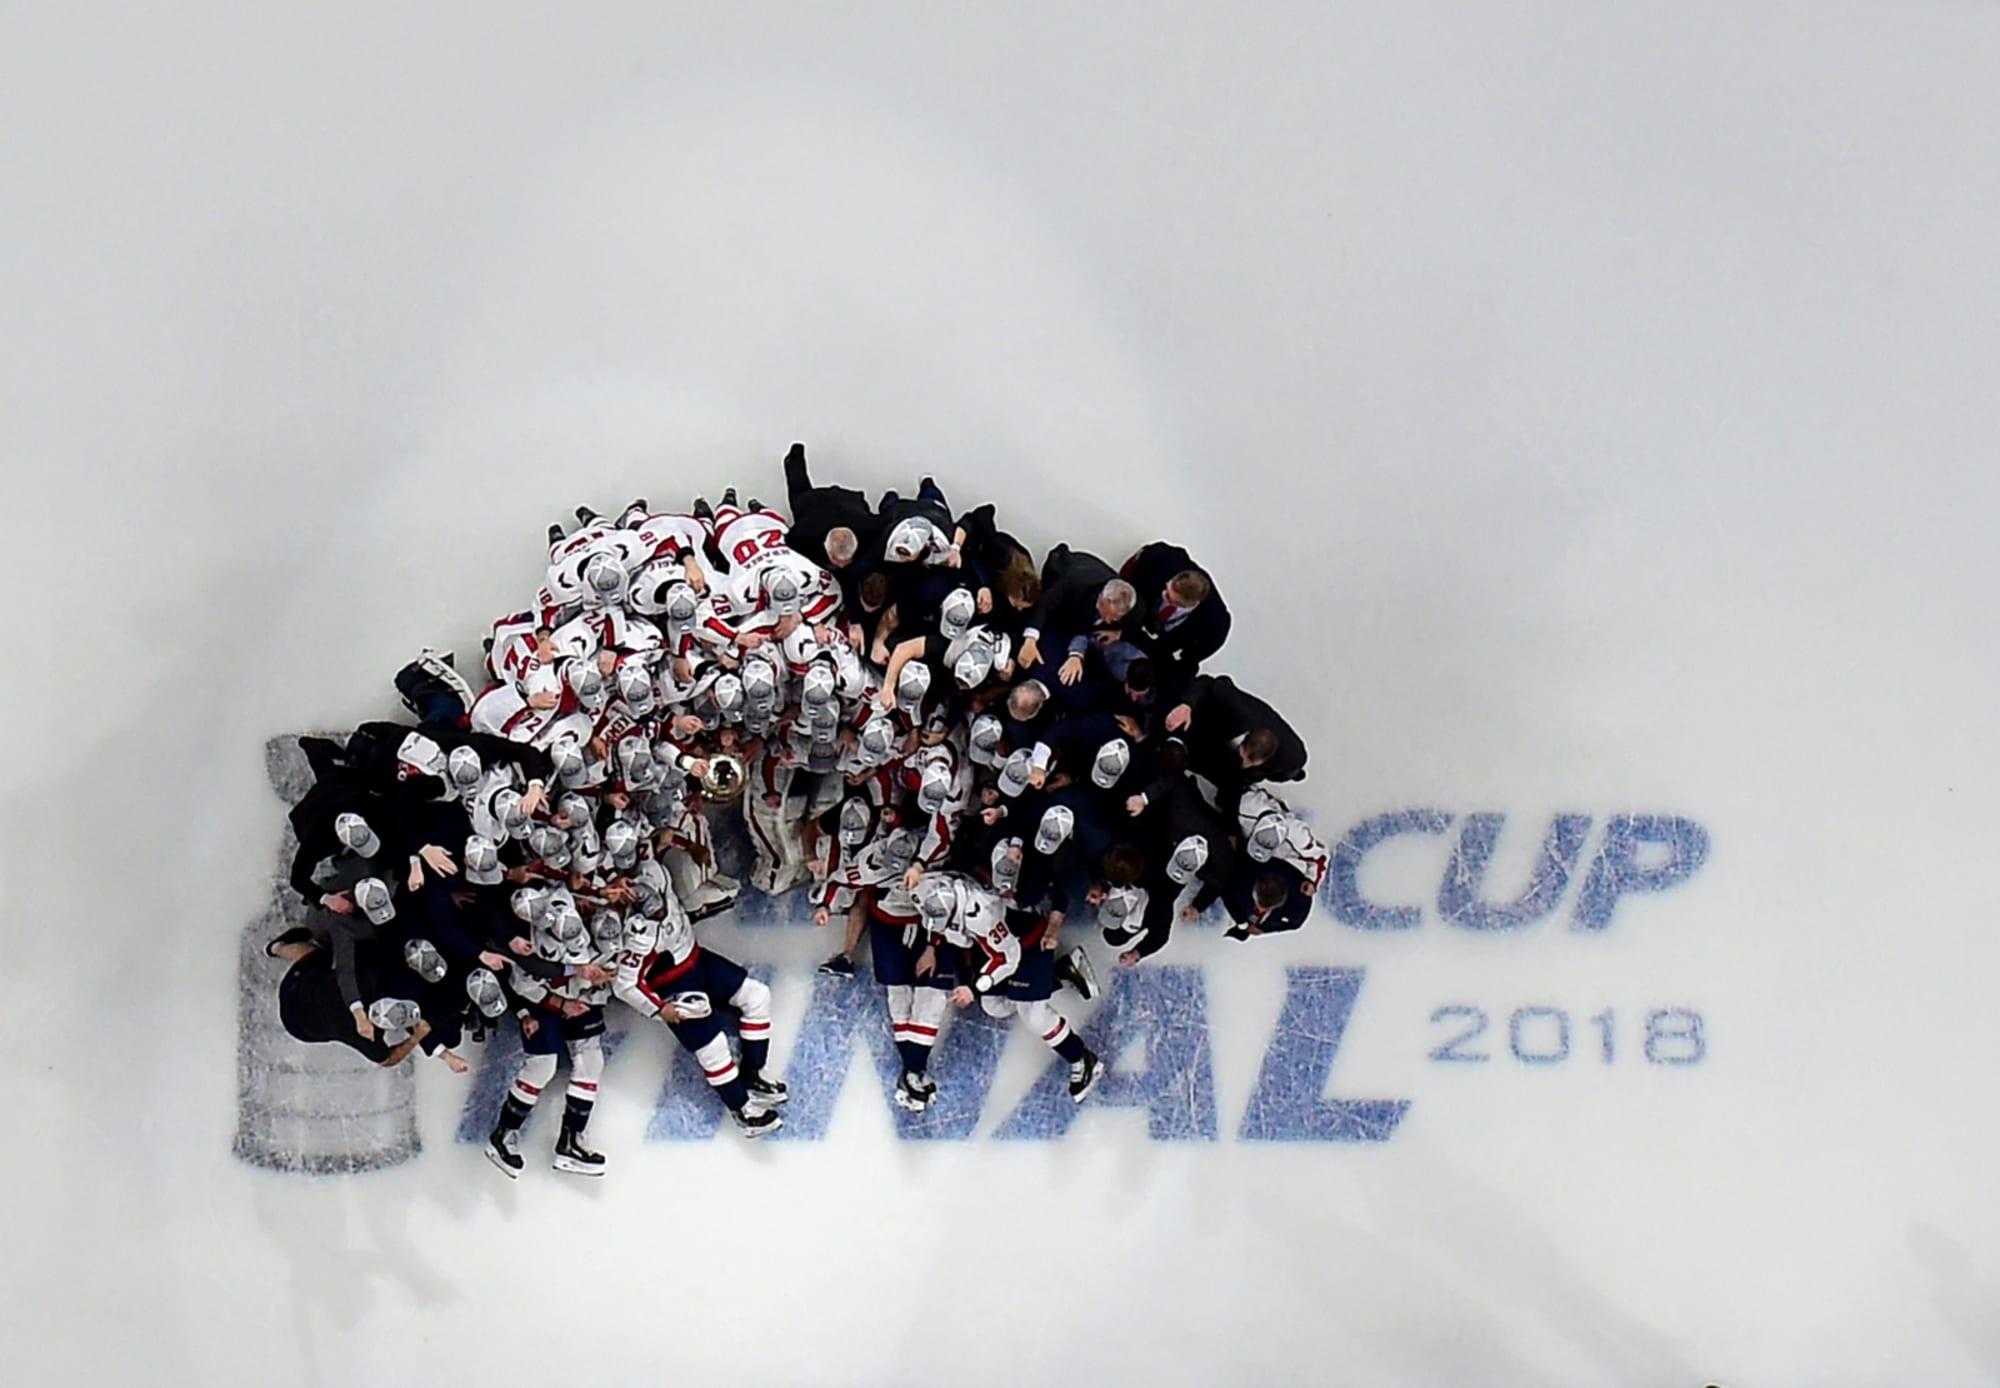 Washington Capitals: Throwback Thursday to championship glory